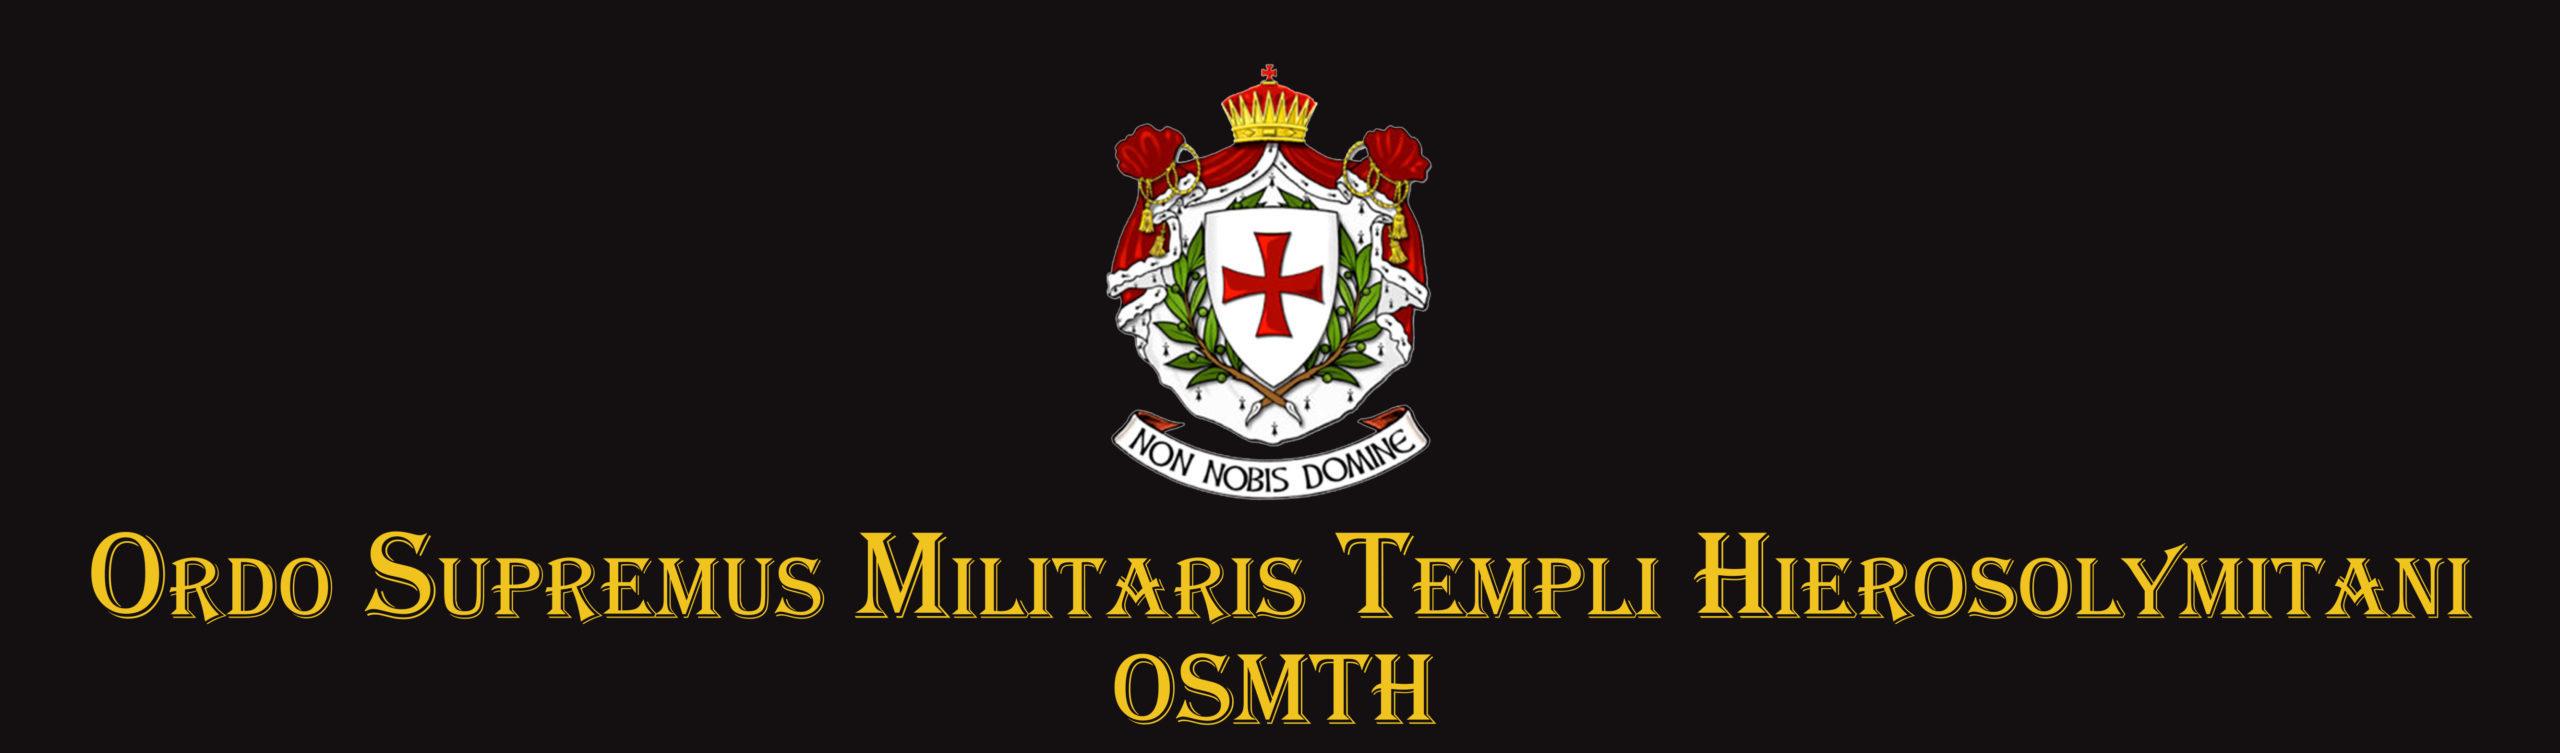 OSMTH